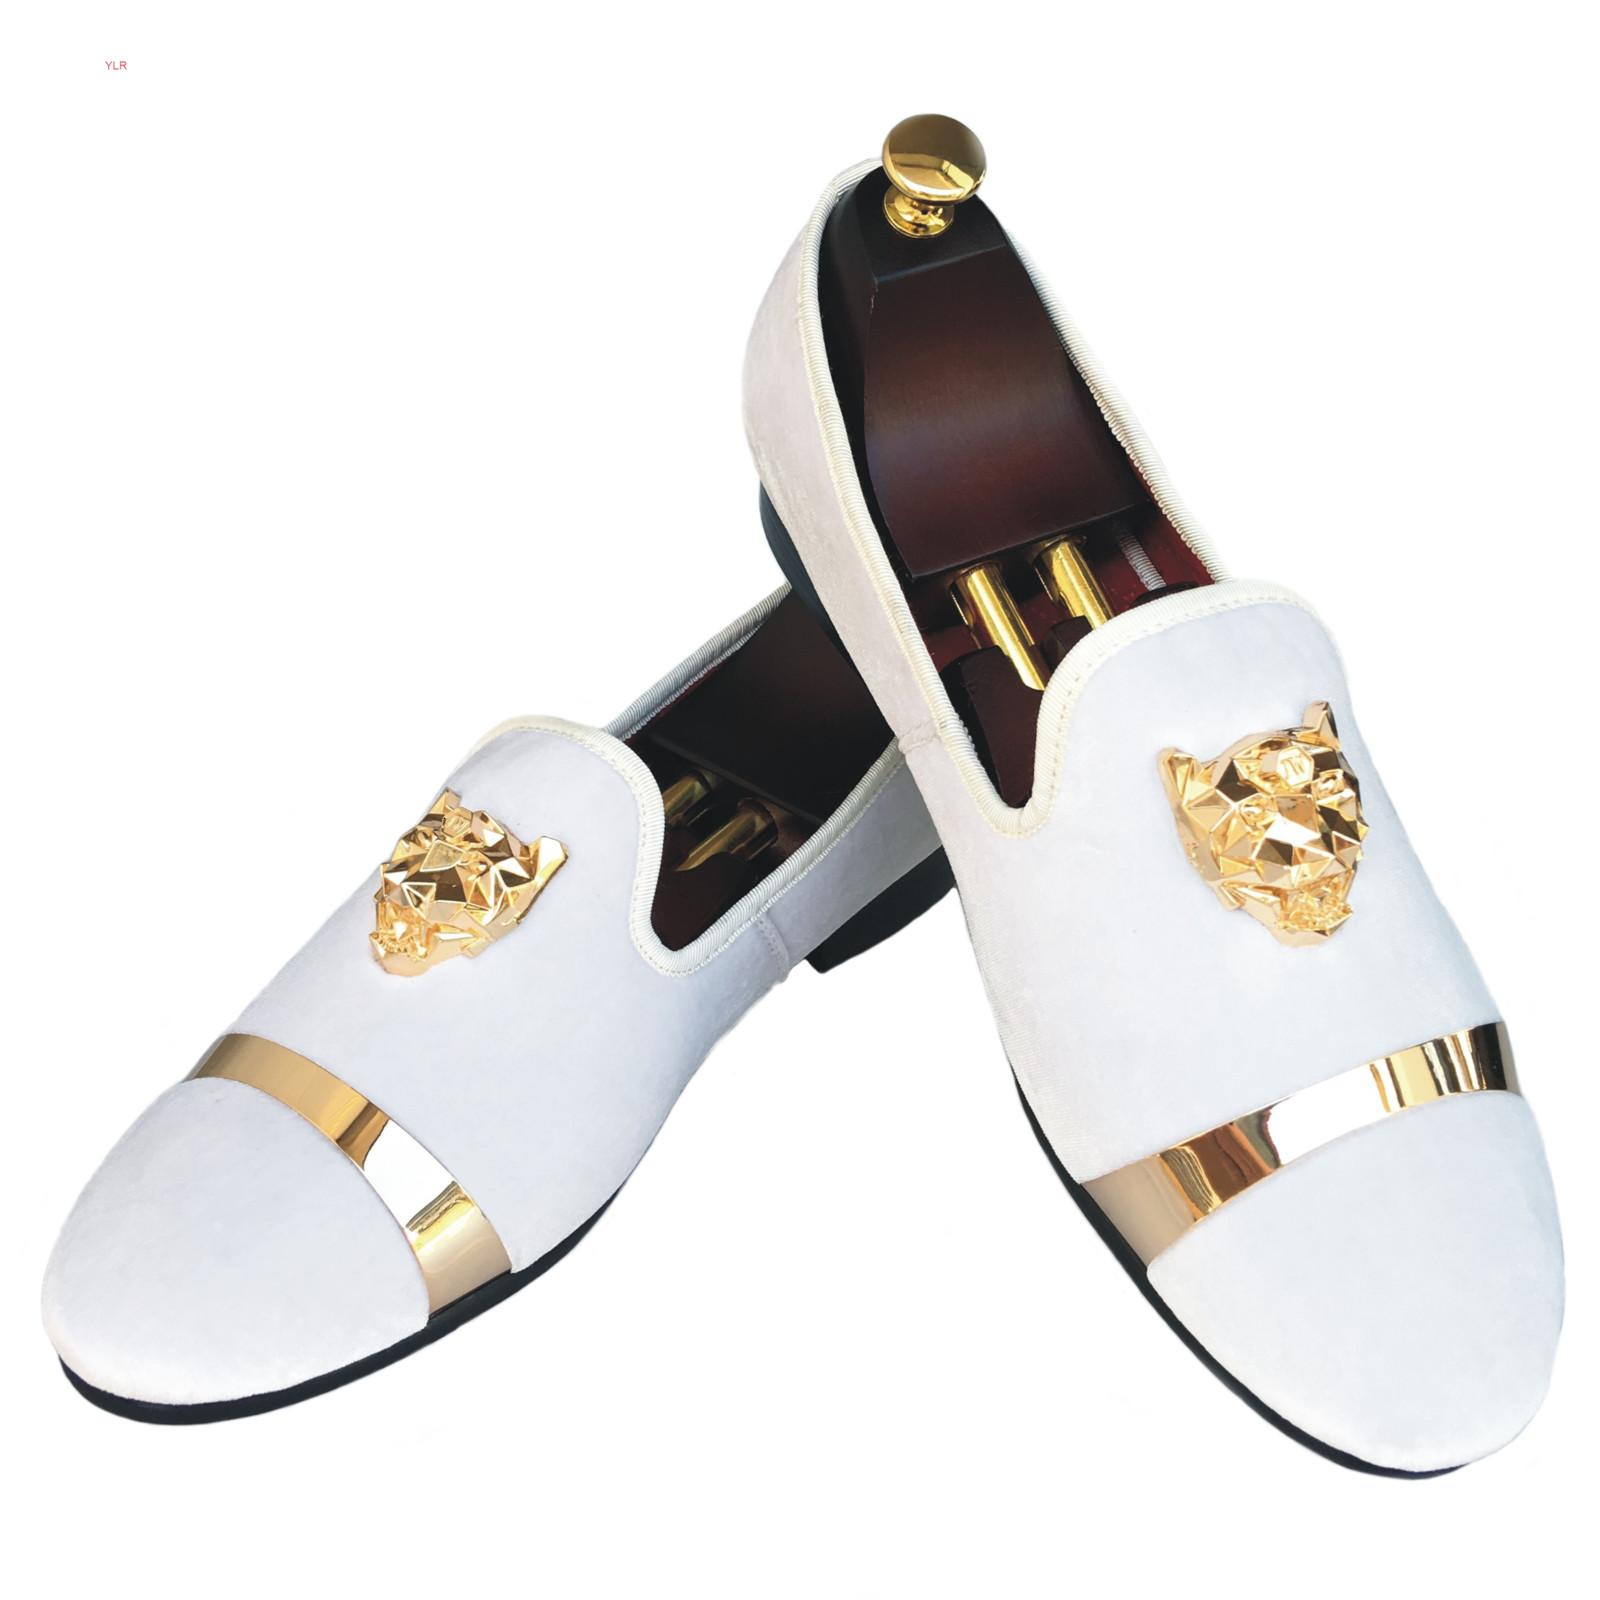 Main Velvet Mocassins hommes pantoufles avec boucle d'or robe de mariée Chaussures Slip-On avec Red Smoking Appartements Black Bottom WhiteT7YA